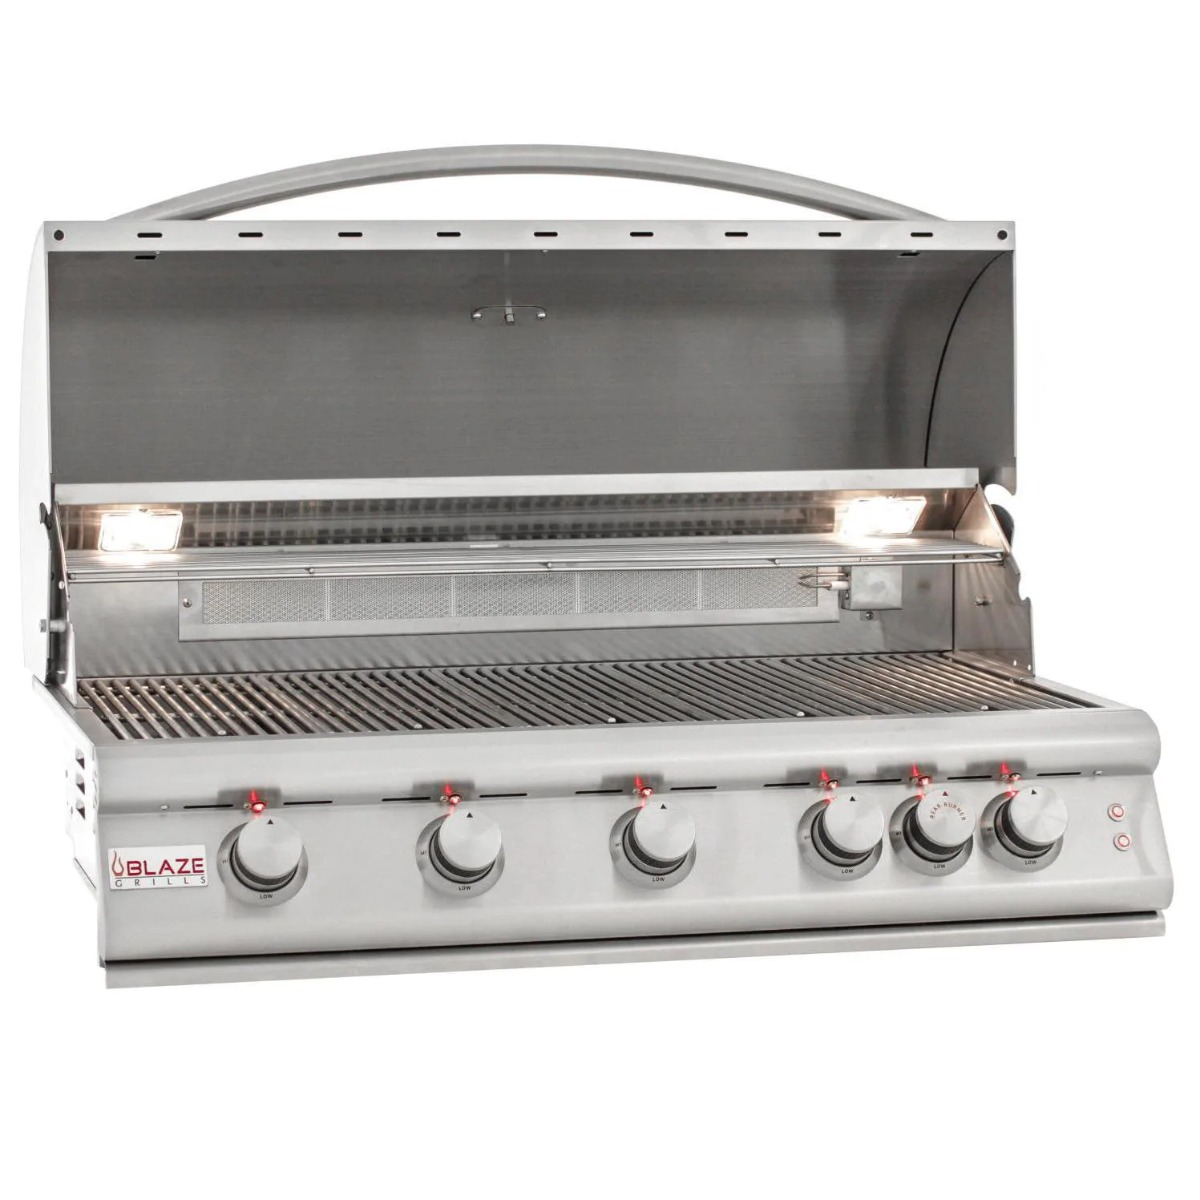 Blaze Premium LTE 40-Inch 5-Burner Built-In Propane Grill with Rotisserie, Rear Infrared Burner & Grill Lights - blz-5lte2-lp-rt